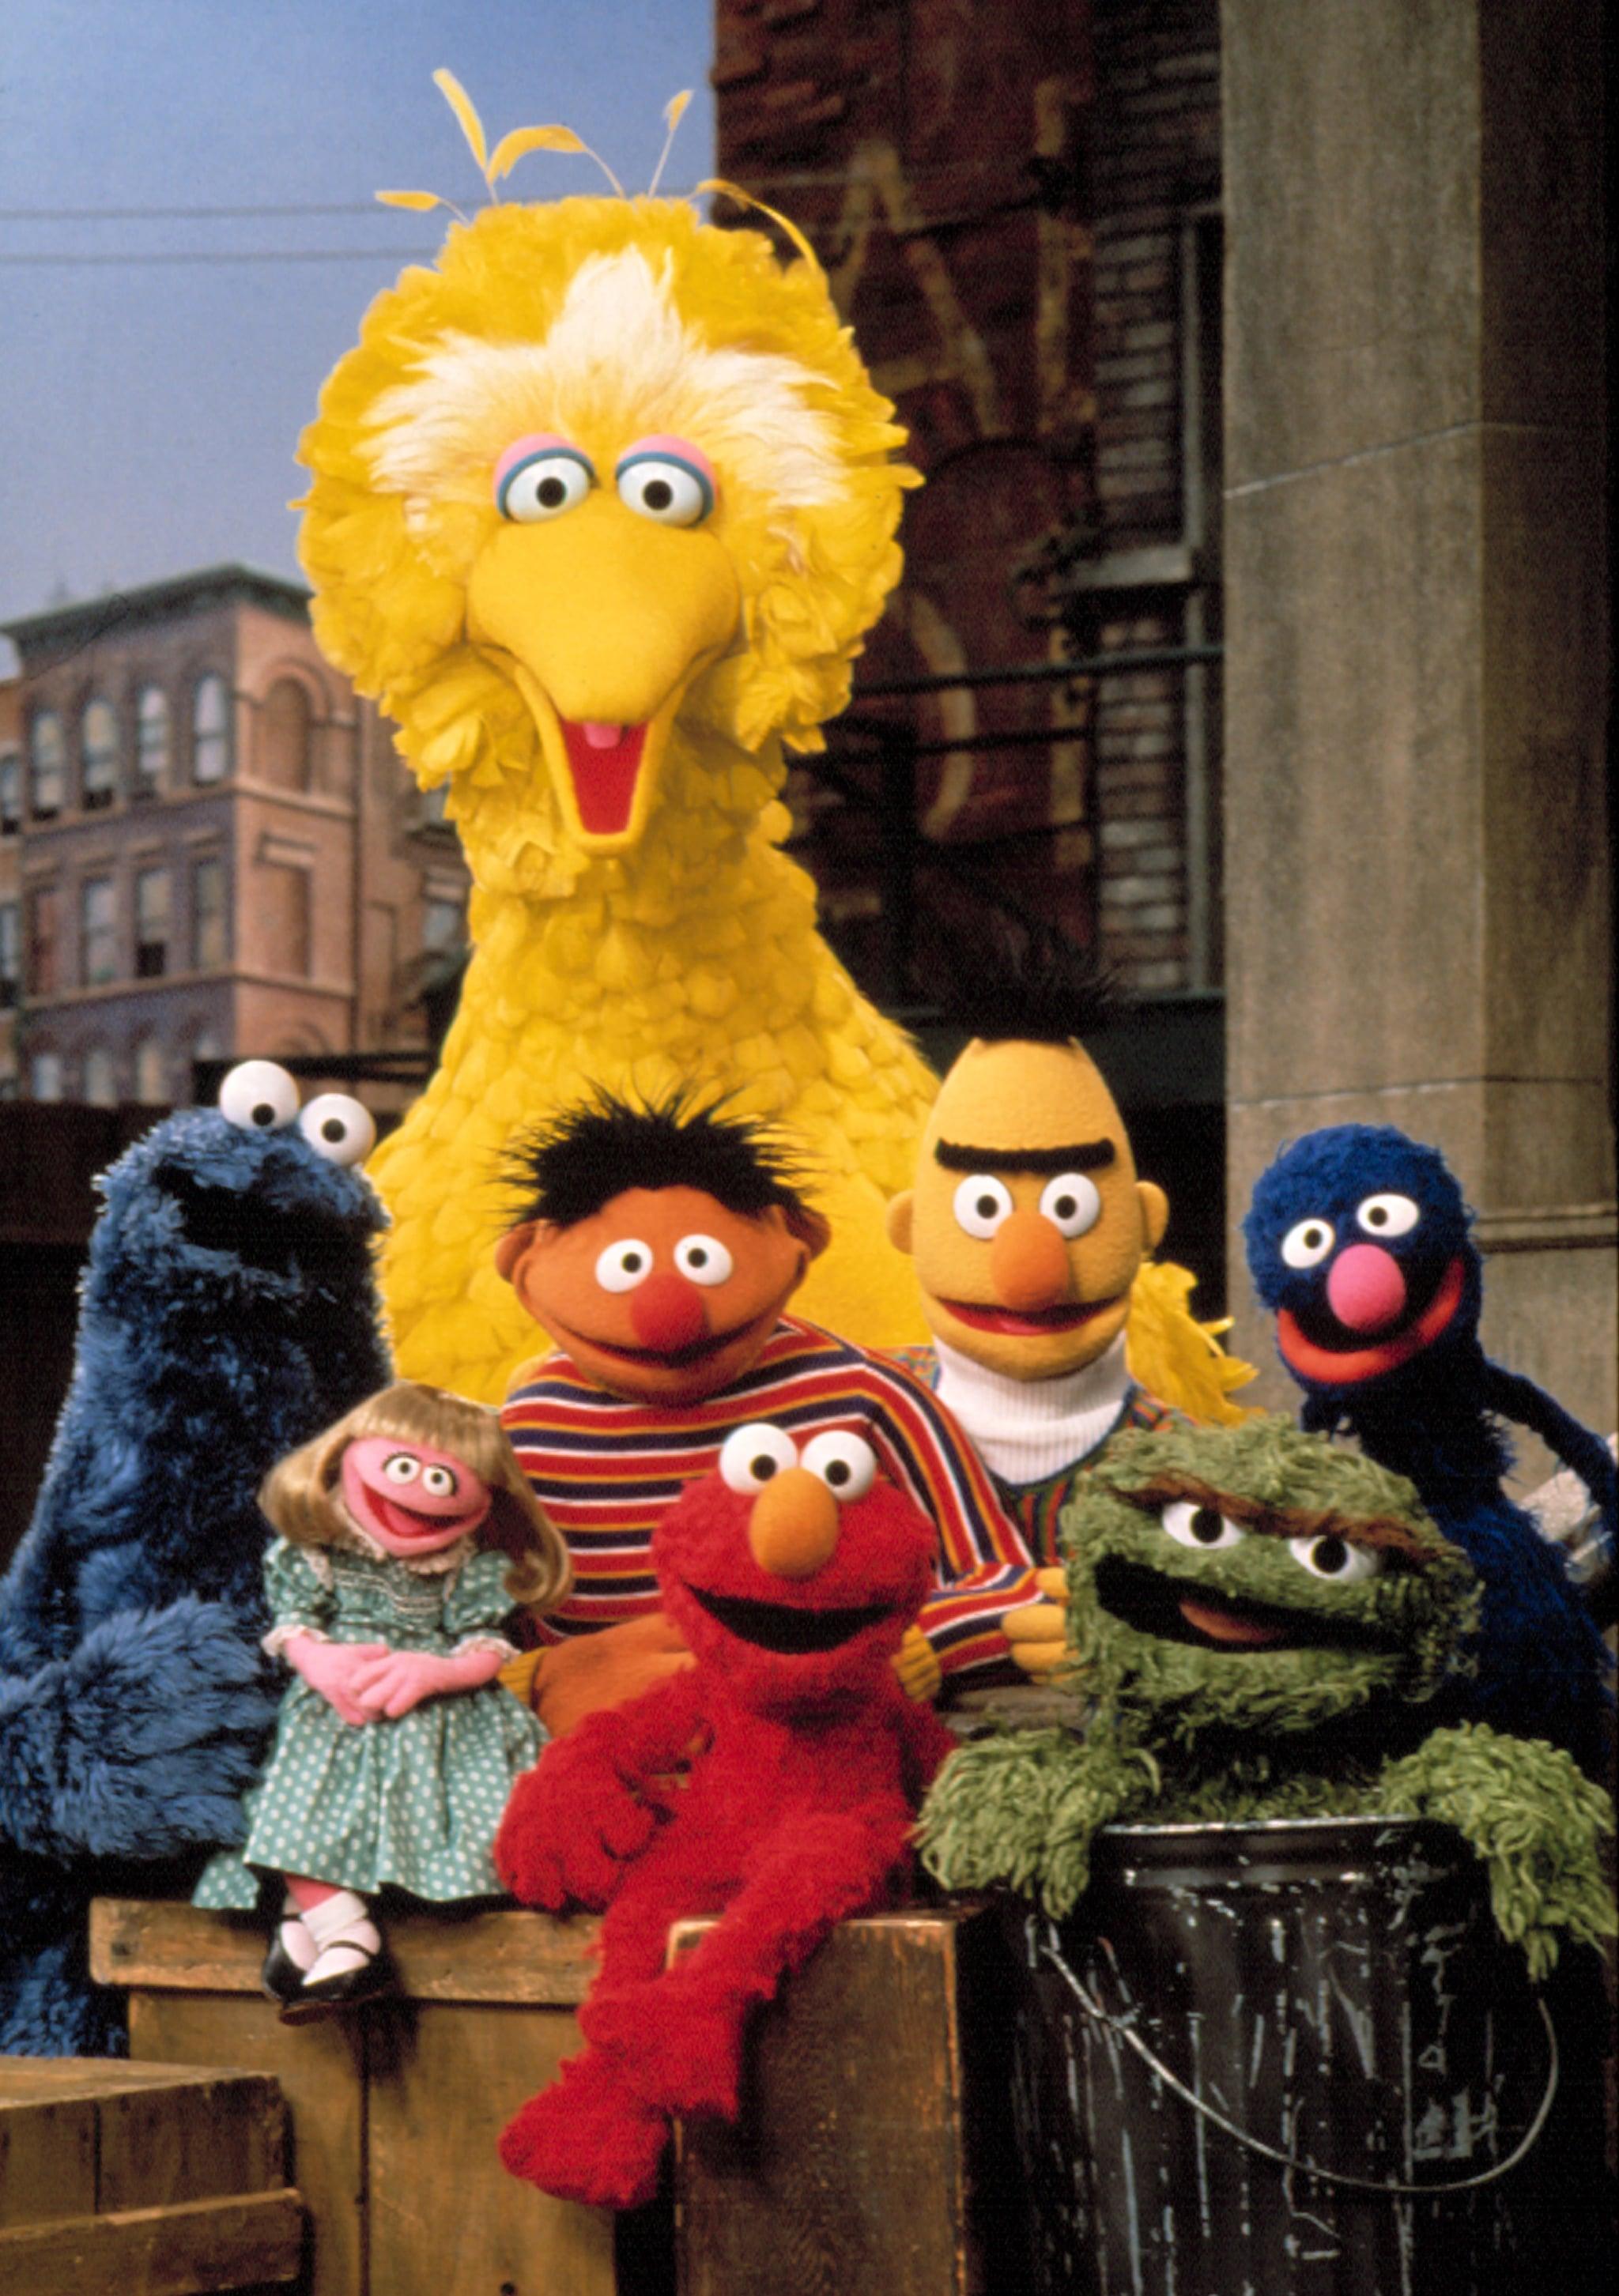 SESAME STREET, (L-R), Cookie Monster, Prairie Dawn, Big Bird, Ernie, Elmo, Bert, Oscar the Grouch, Grover, celebrating Season 25, 1993-1994. (c)CTW. Courtesy:Everett Collection